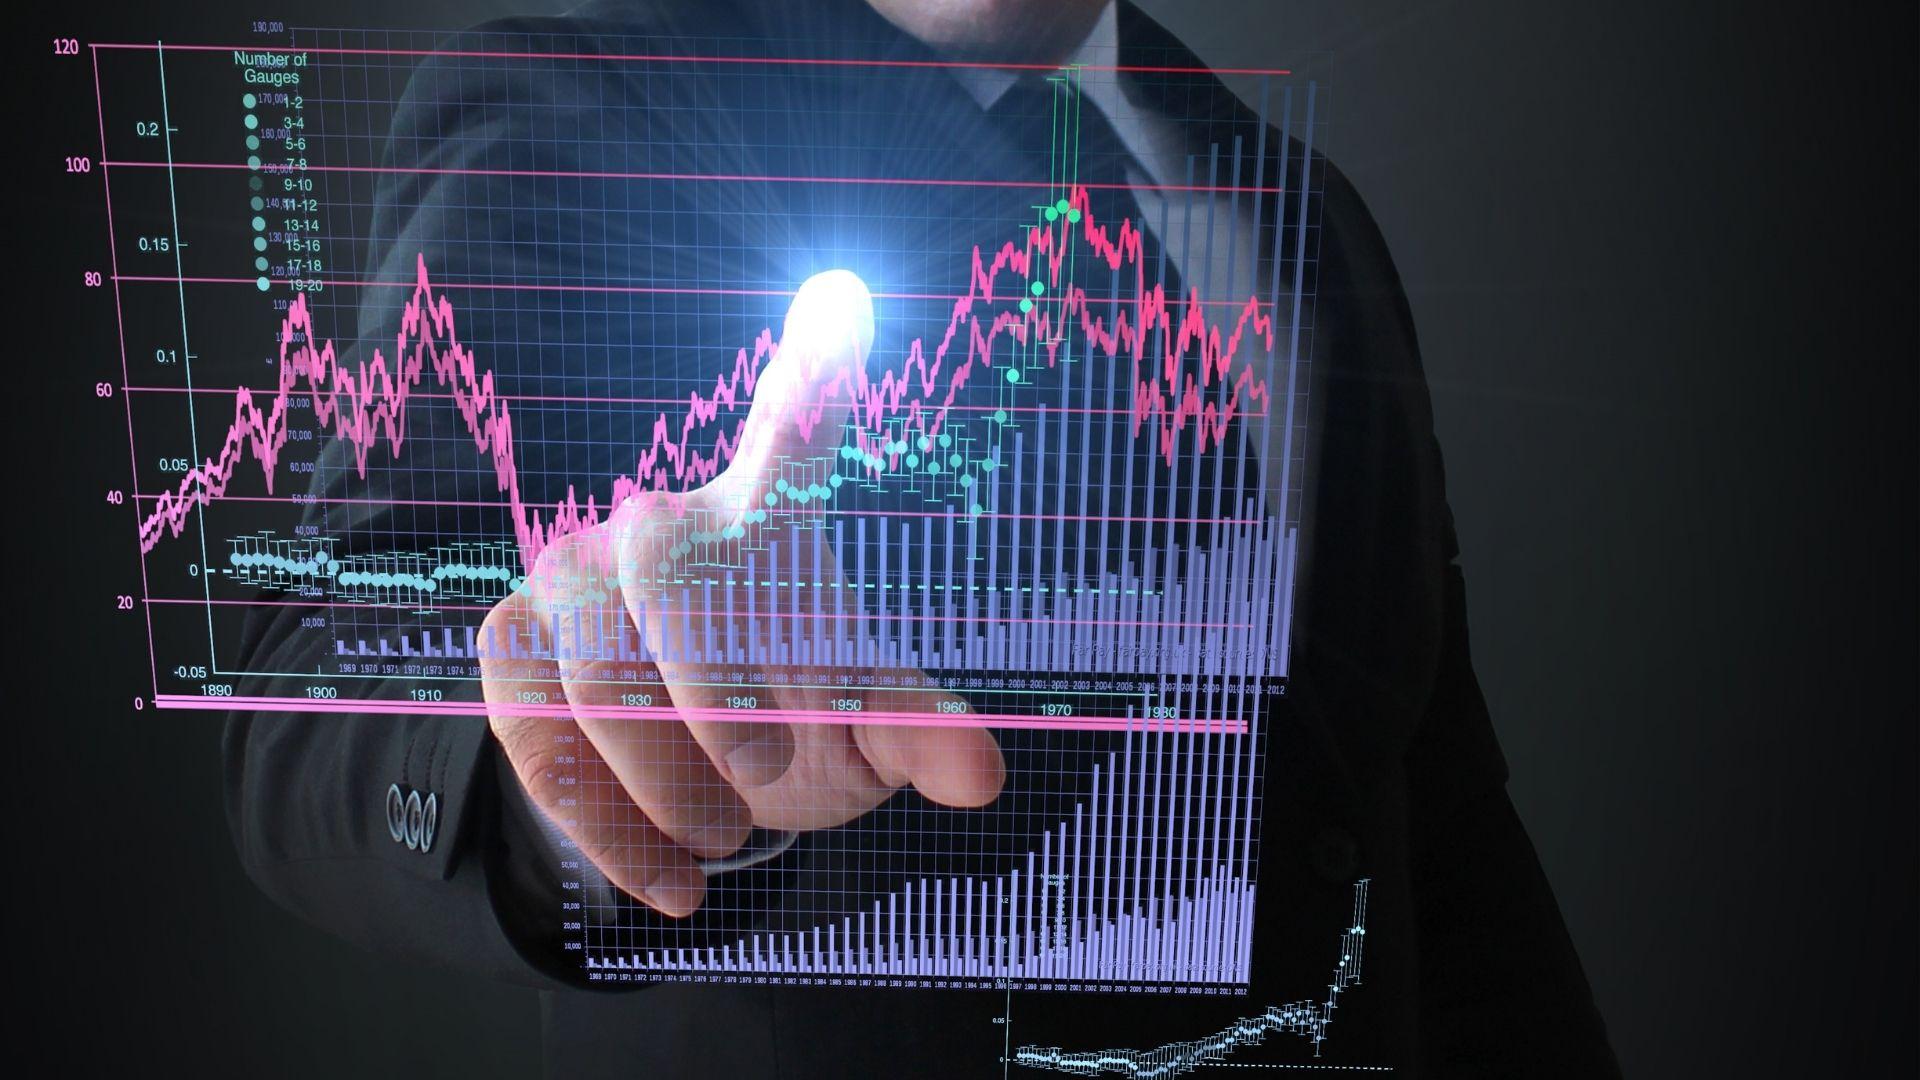 Digital Finance: Unlocking New Capital in Disrupted Markets 38